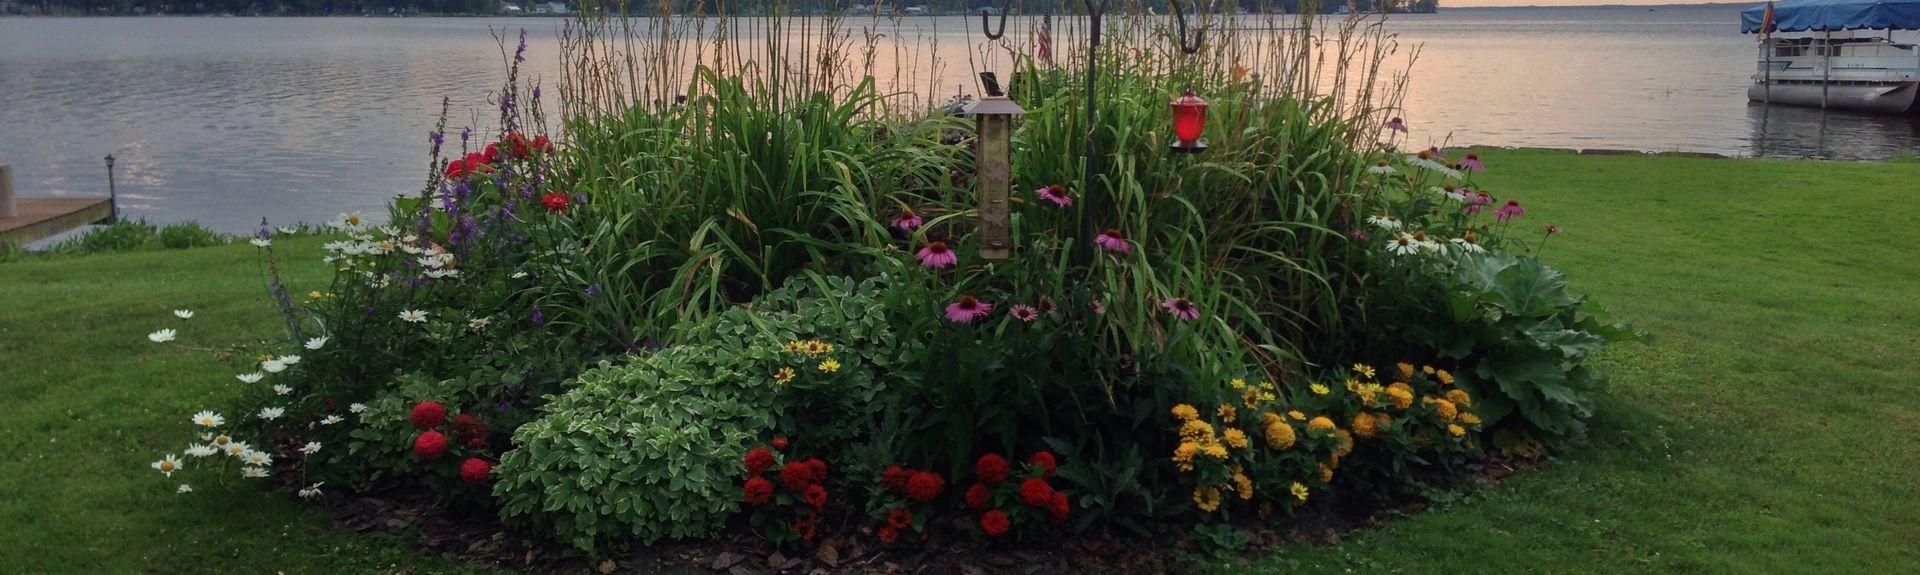 Oneida Shores Park, Brewerton, NY, USA